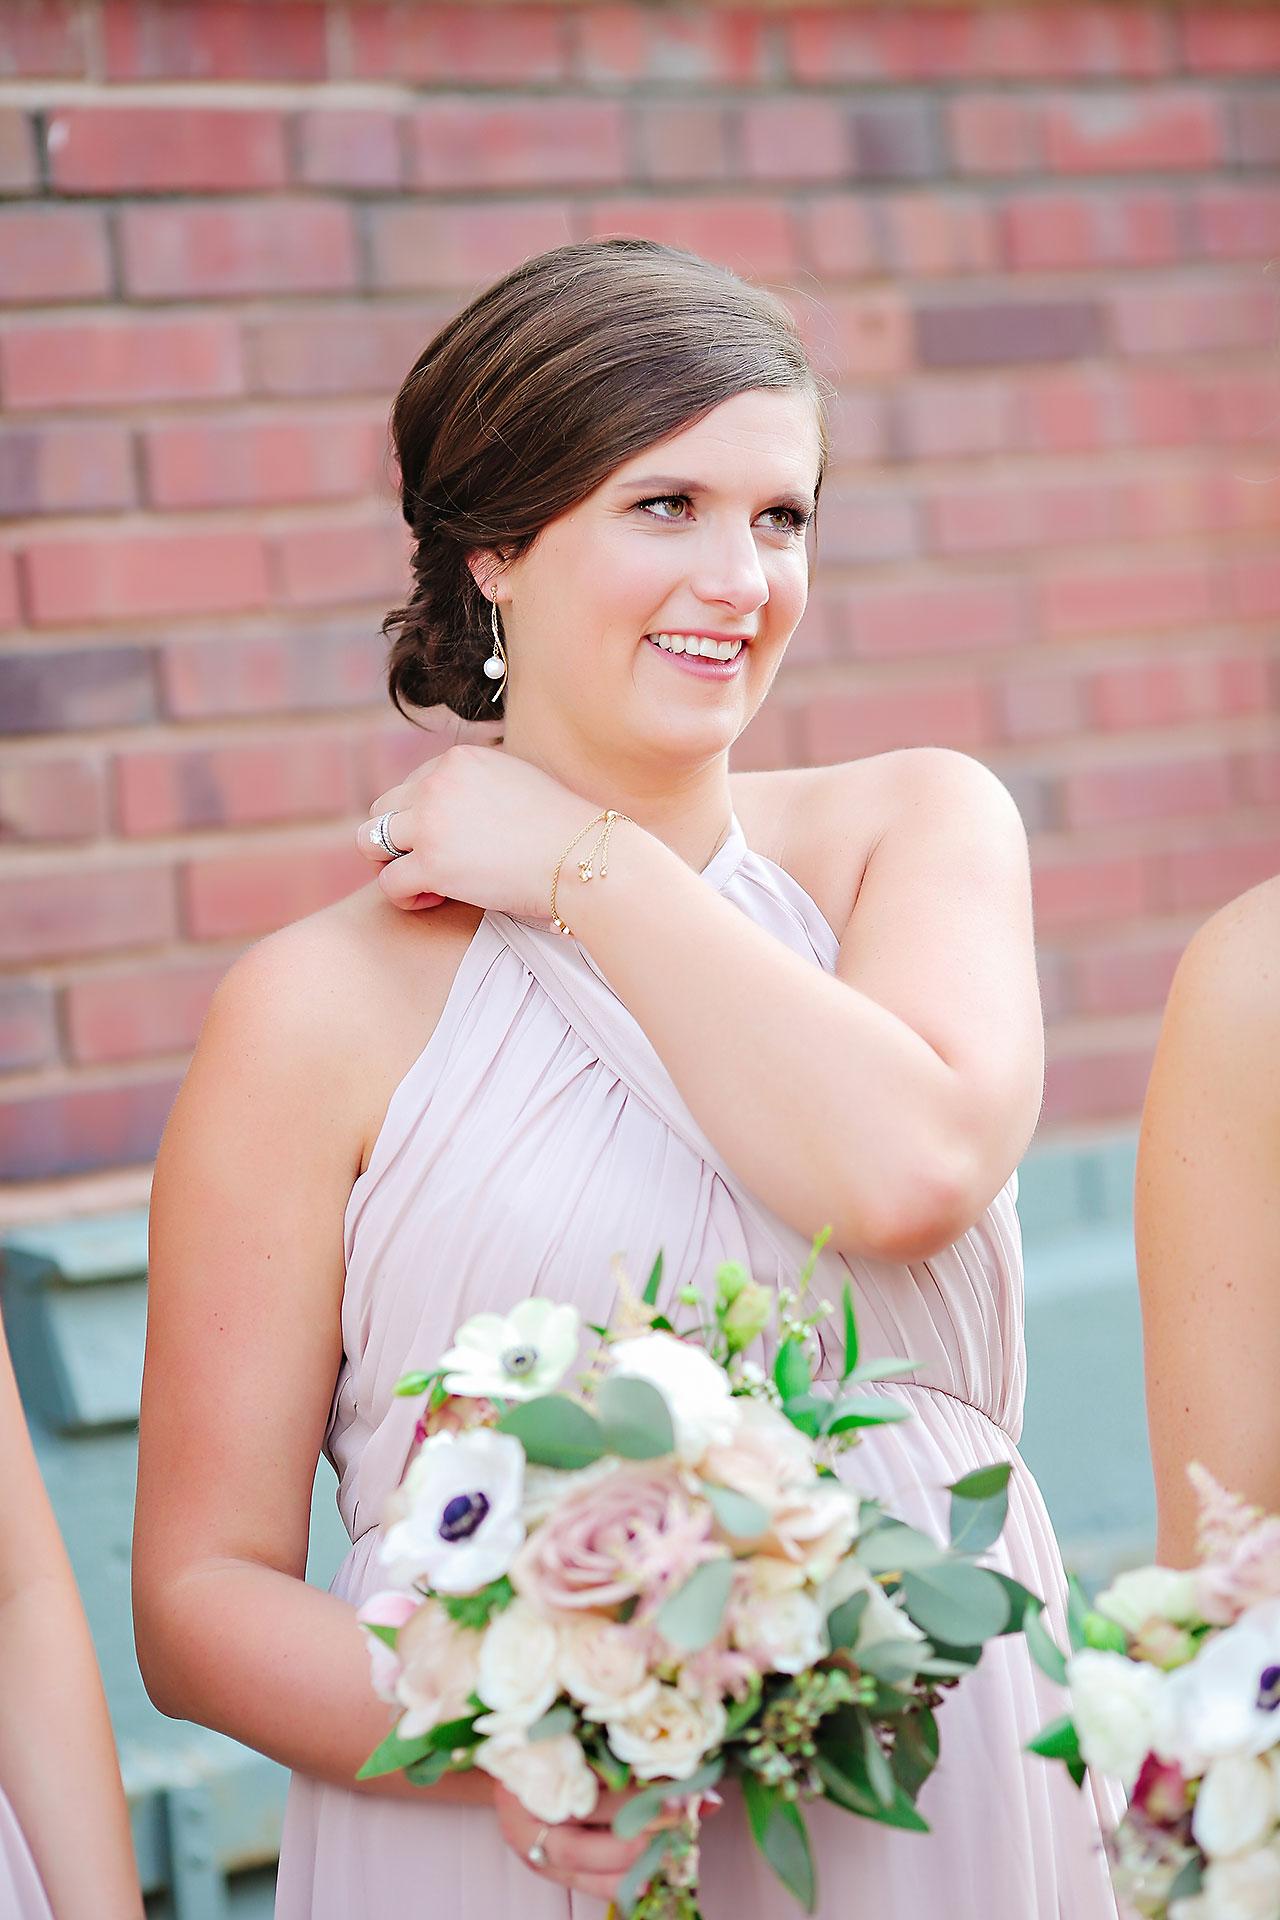 Molly Declan Scottish Rite Indianapolis Wedding 096